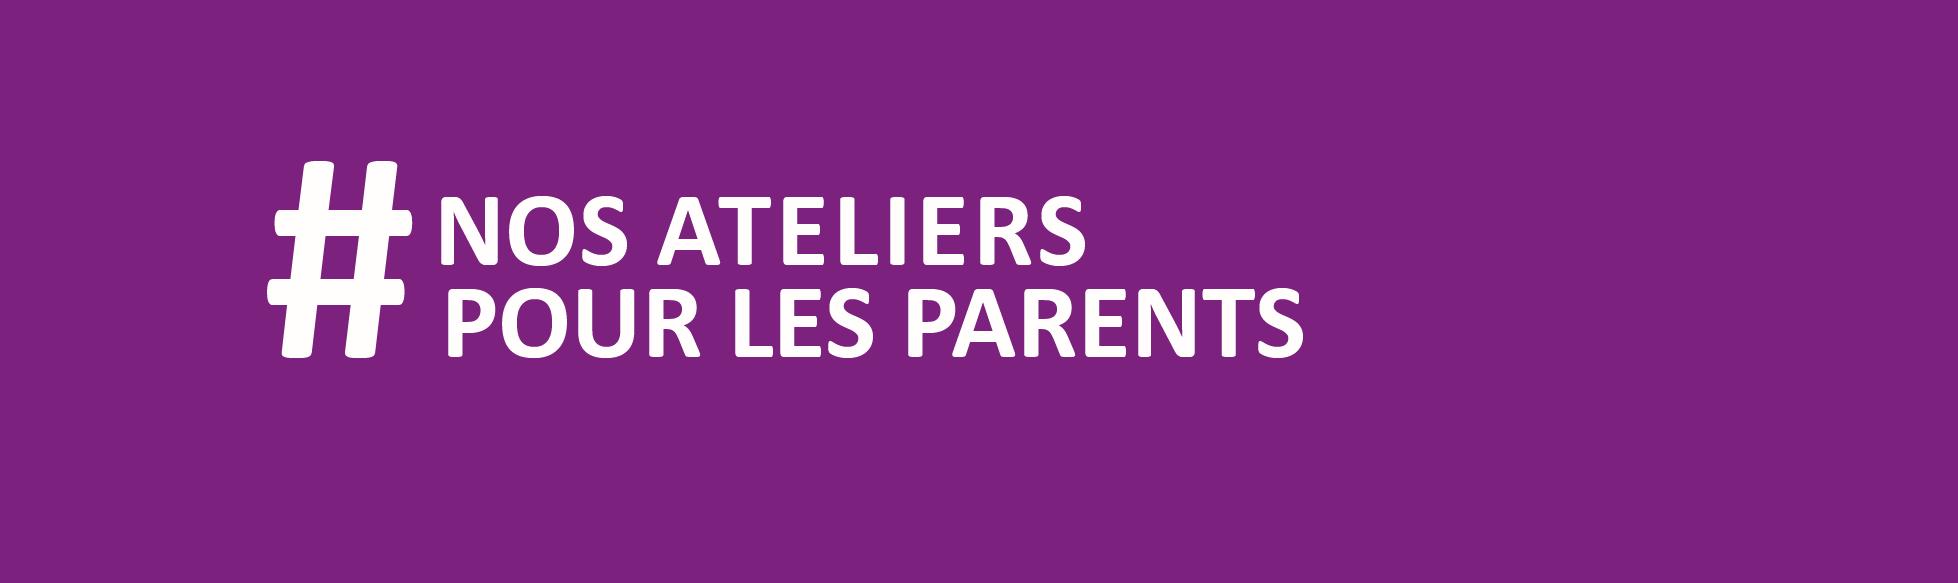 Newsletter PARENTS